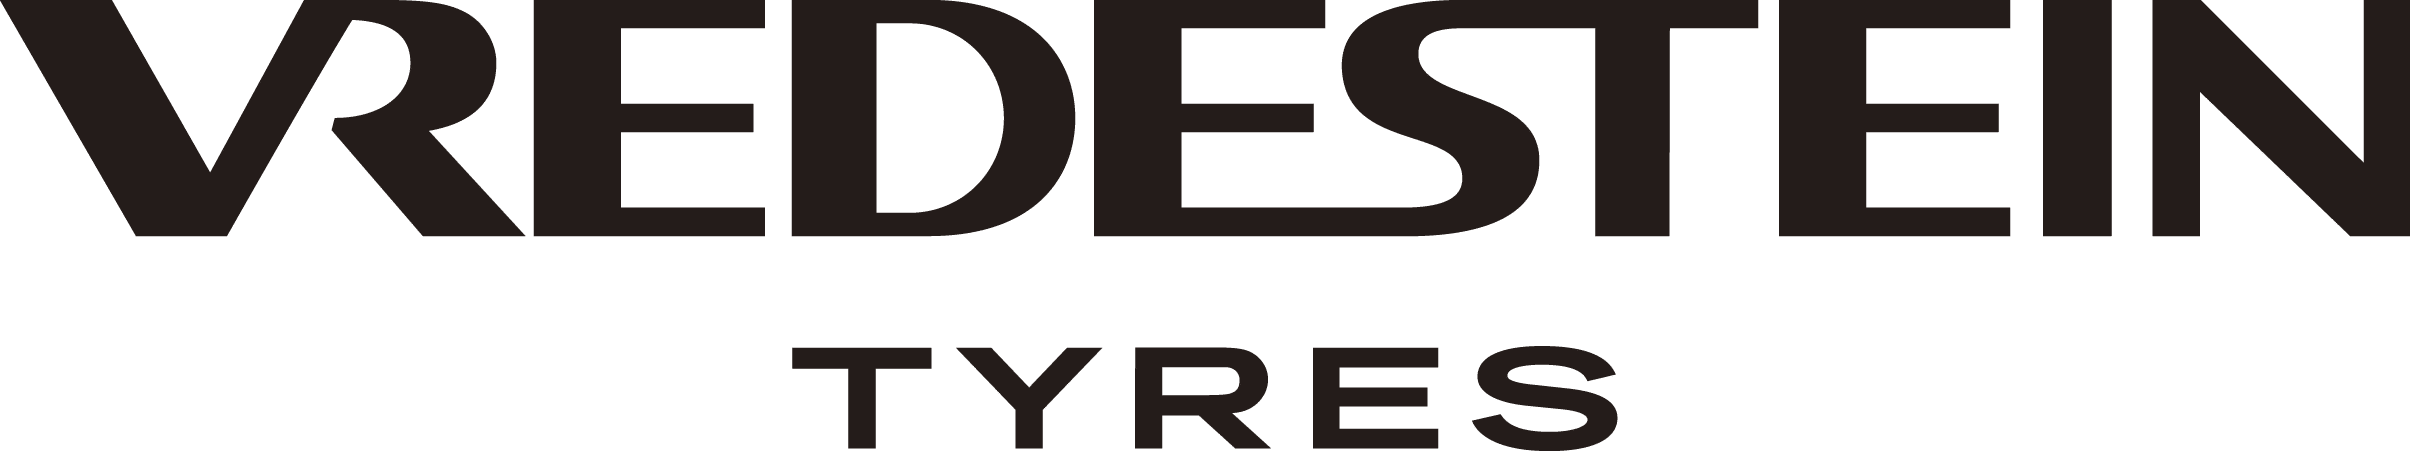 Vredestein Tyres Logo